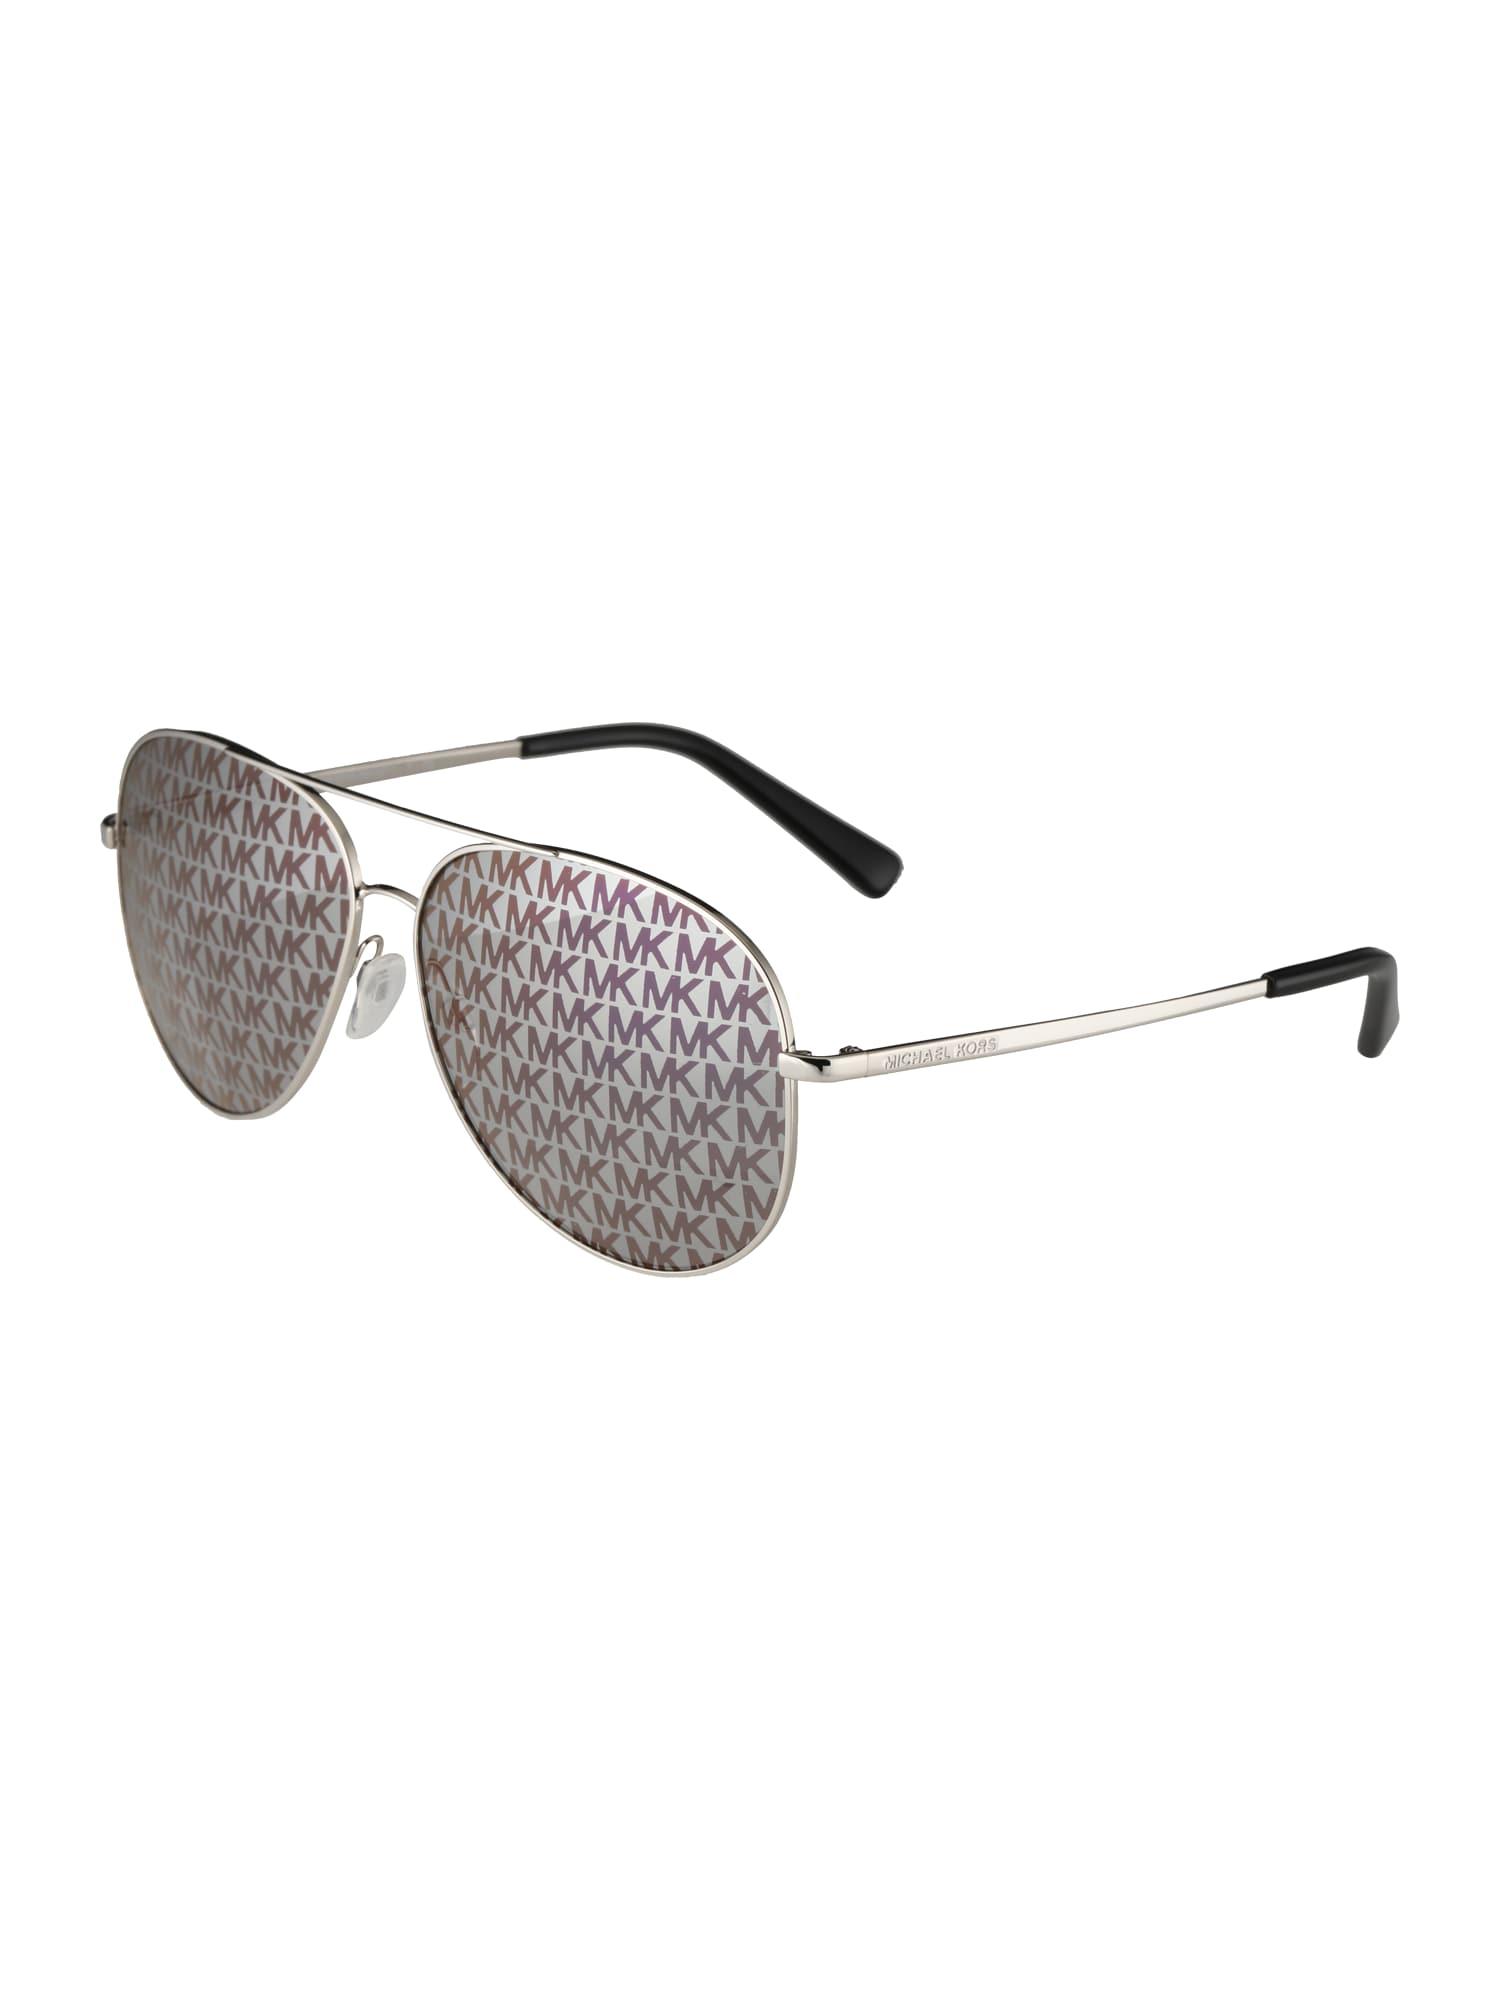 Sluneční brýle KENDALL stříbrná Michael Kors